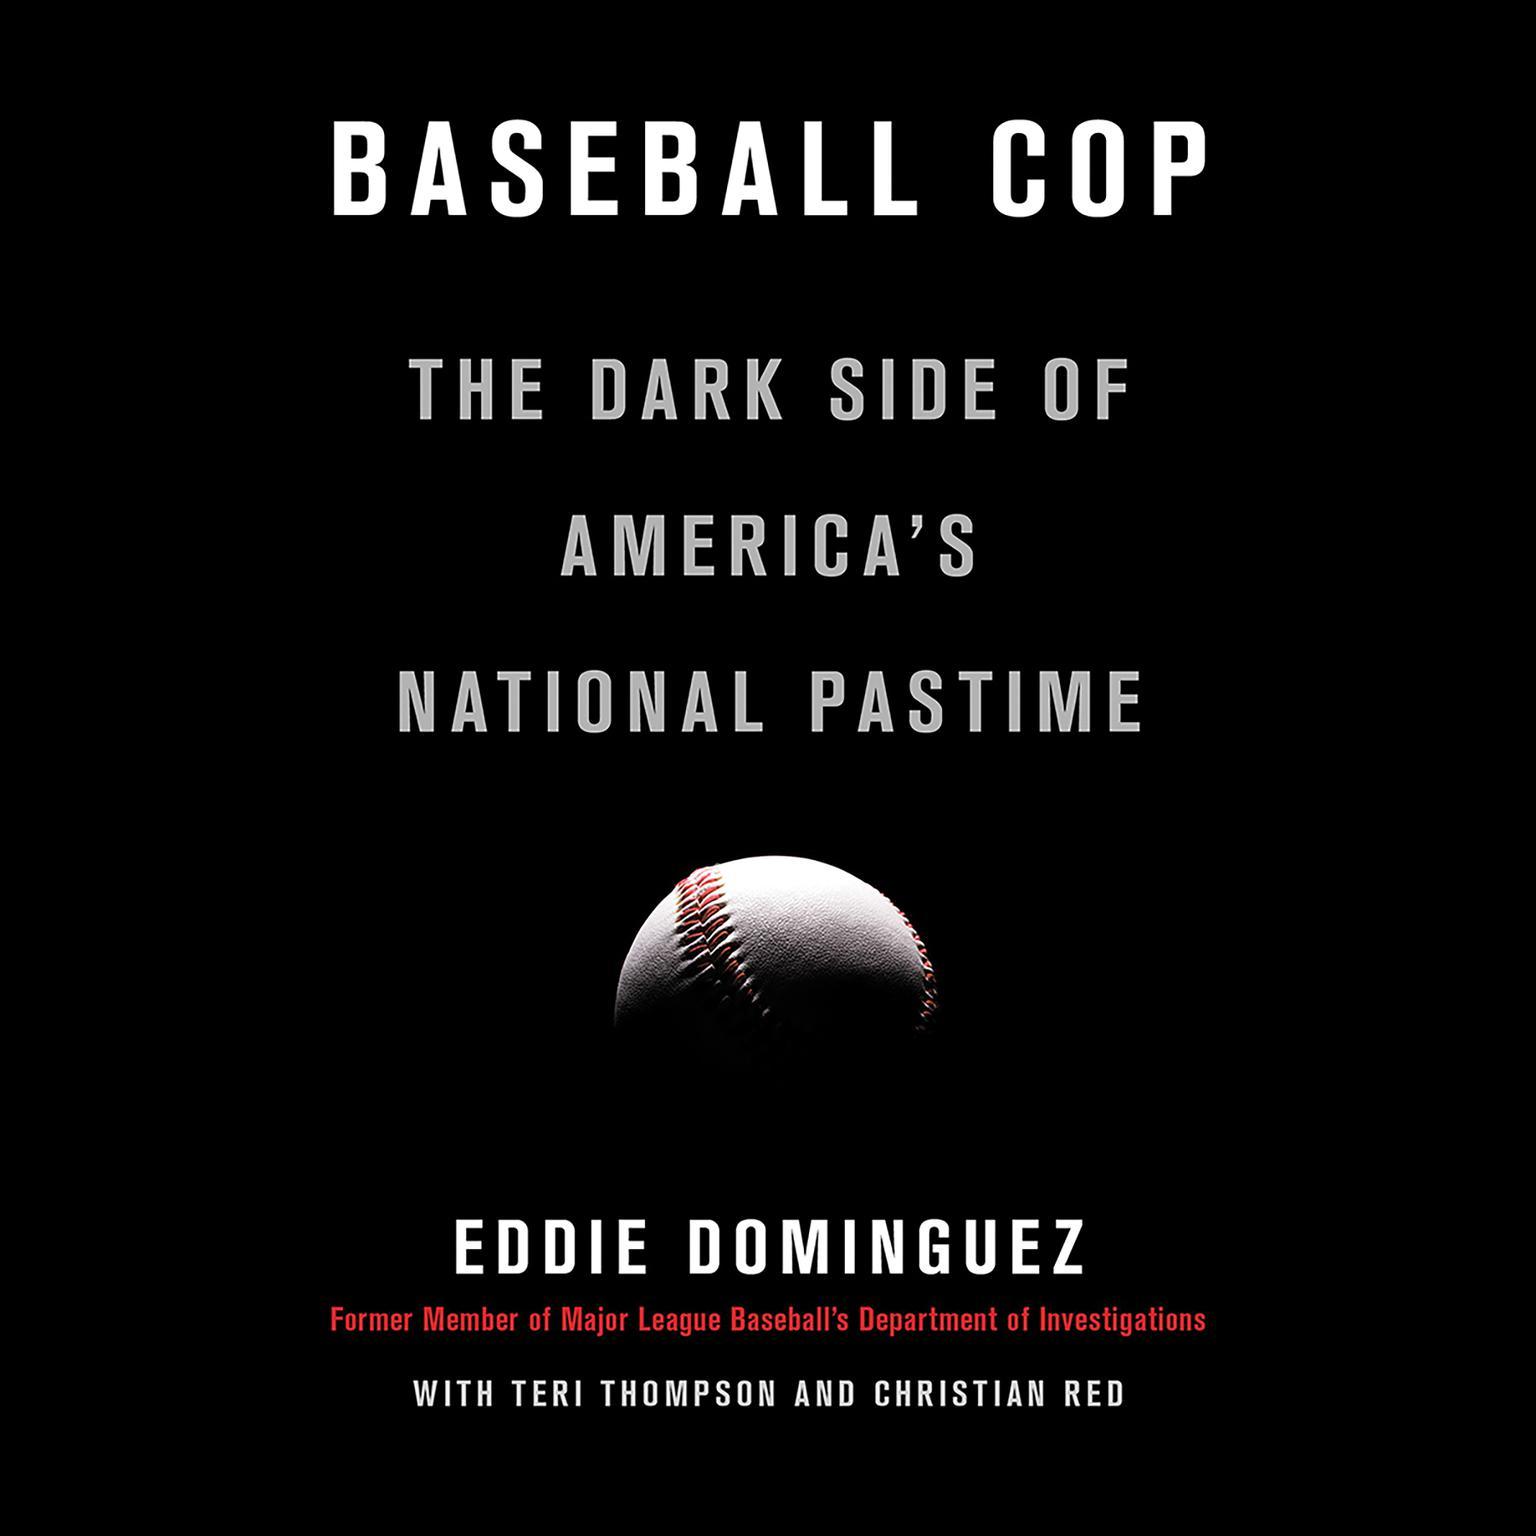 Baseball Cop: The Dark Side of America's National Pastime Audiobook, by Eddie Dominguez